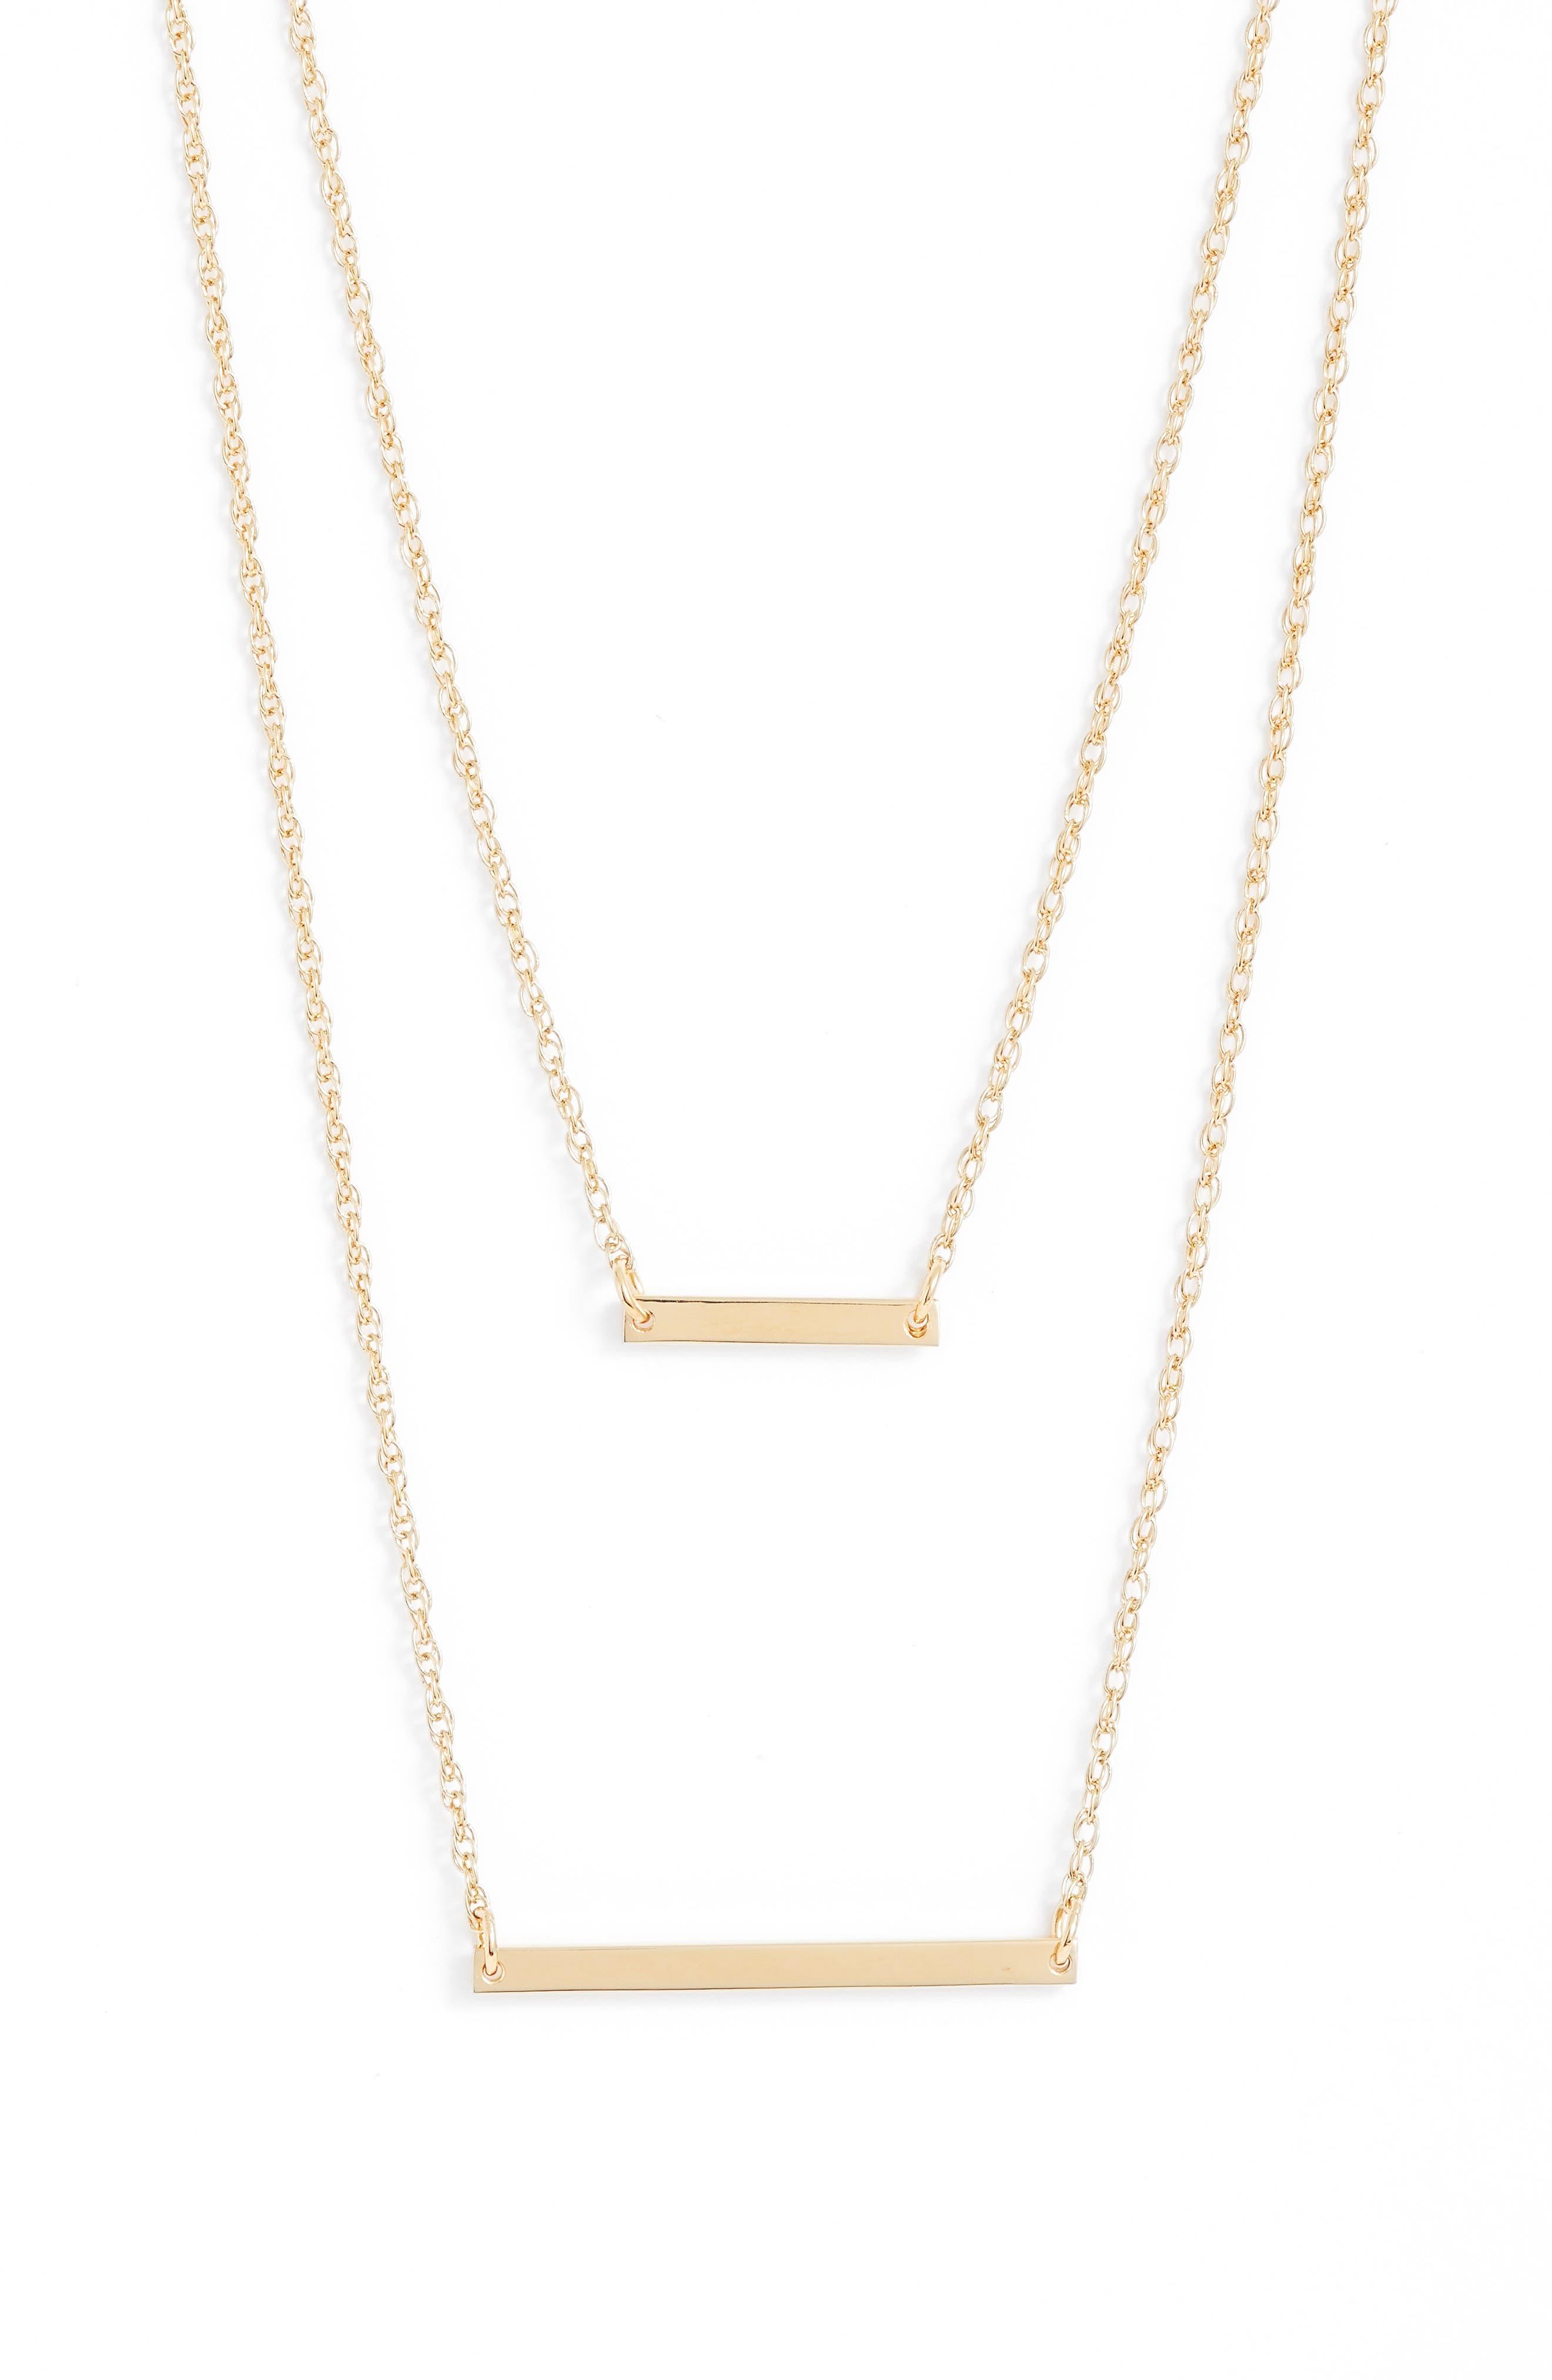 JENNIFER ZEUNER, Cynthia Layered Pendant Necklace, Main thumbnail 1, color, GOLD VERMEIL